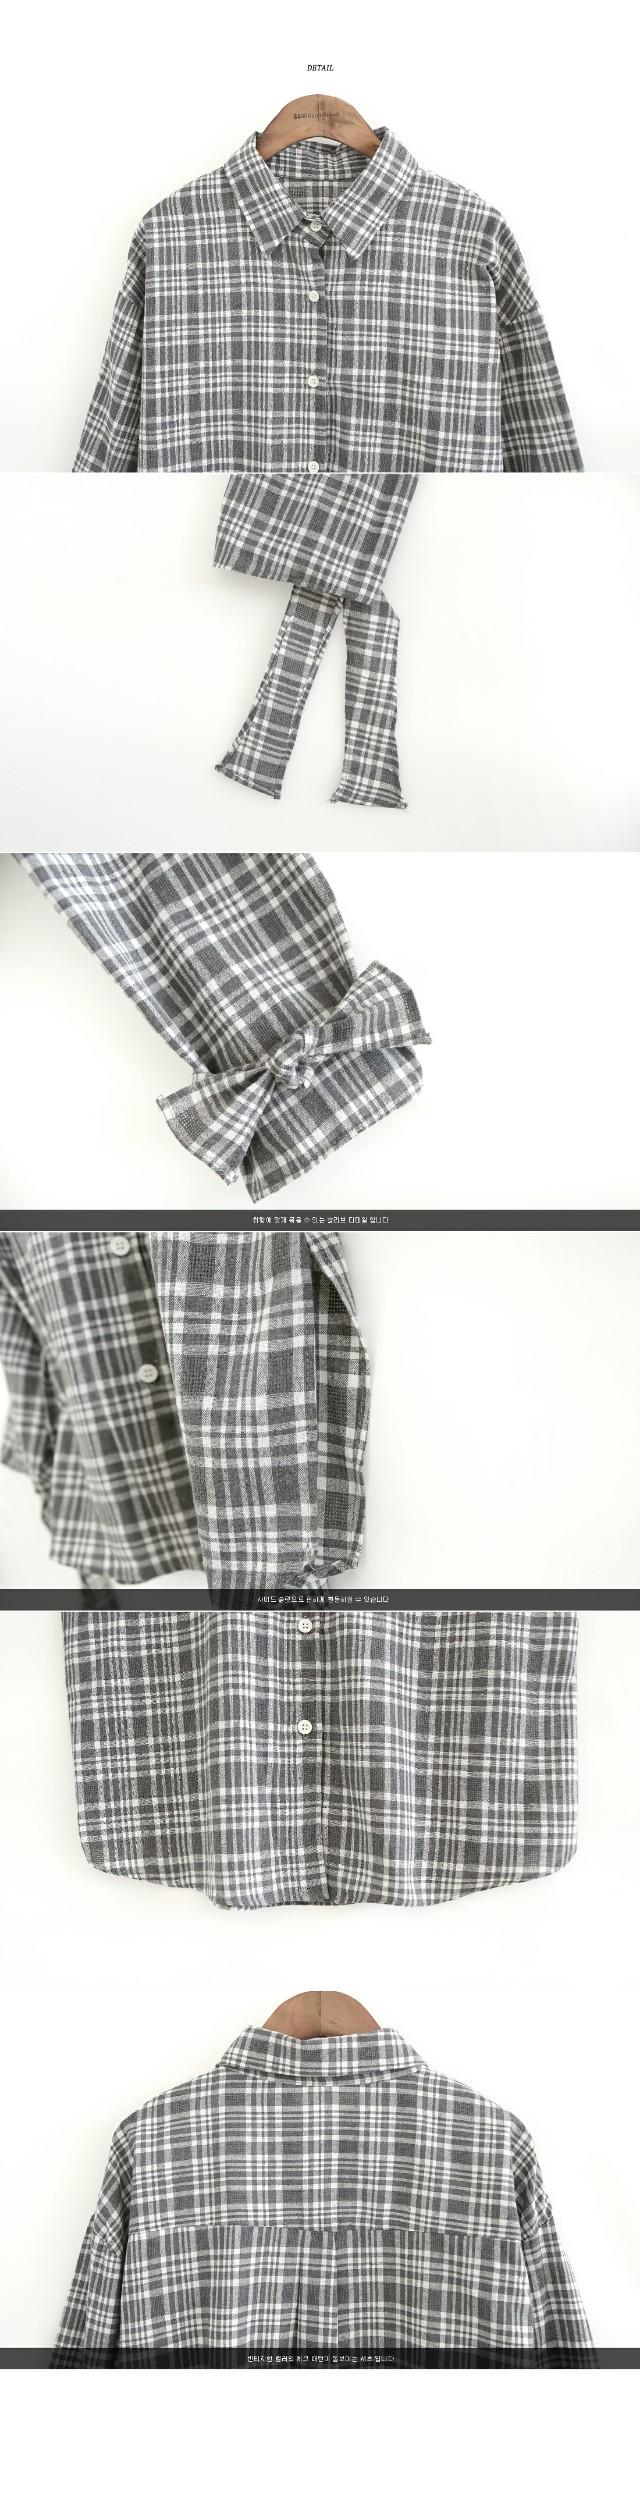 CHECK SLEEVE DETAIL SHIRTS